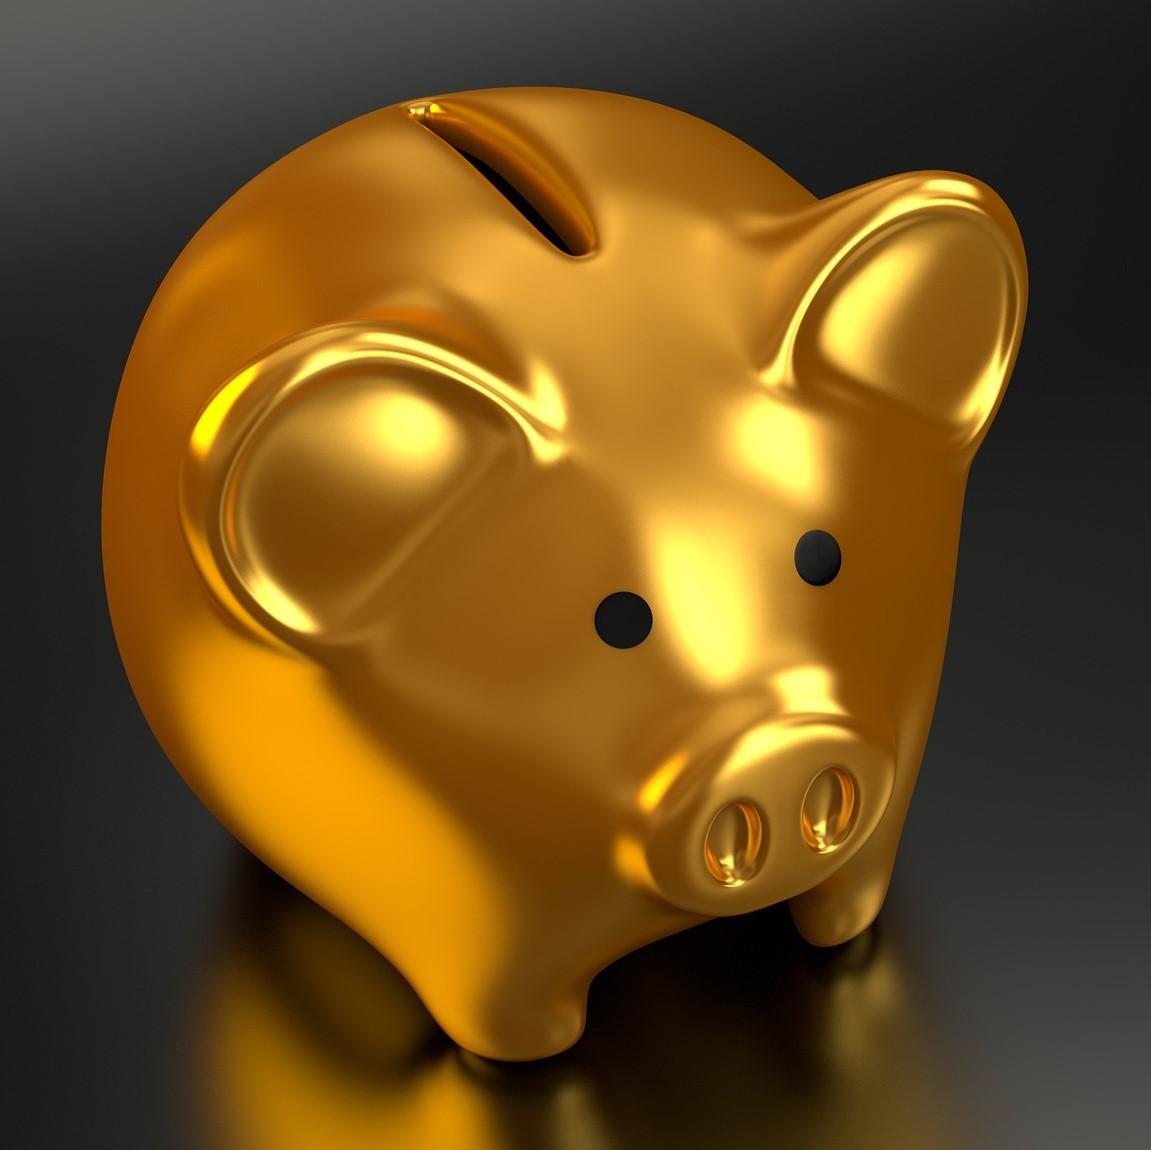 401k worth